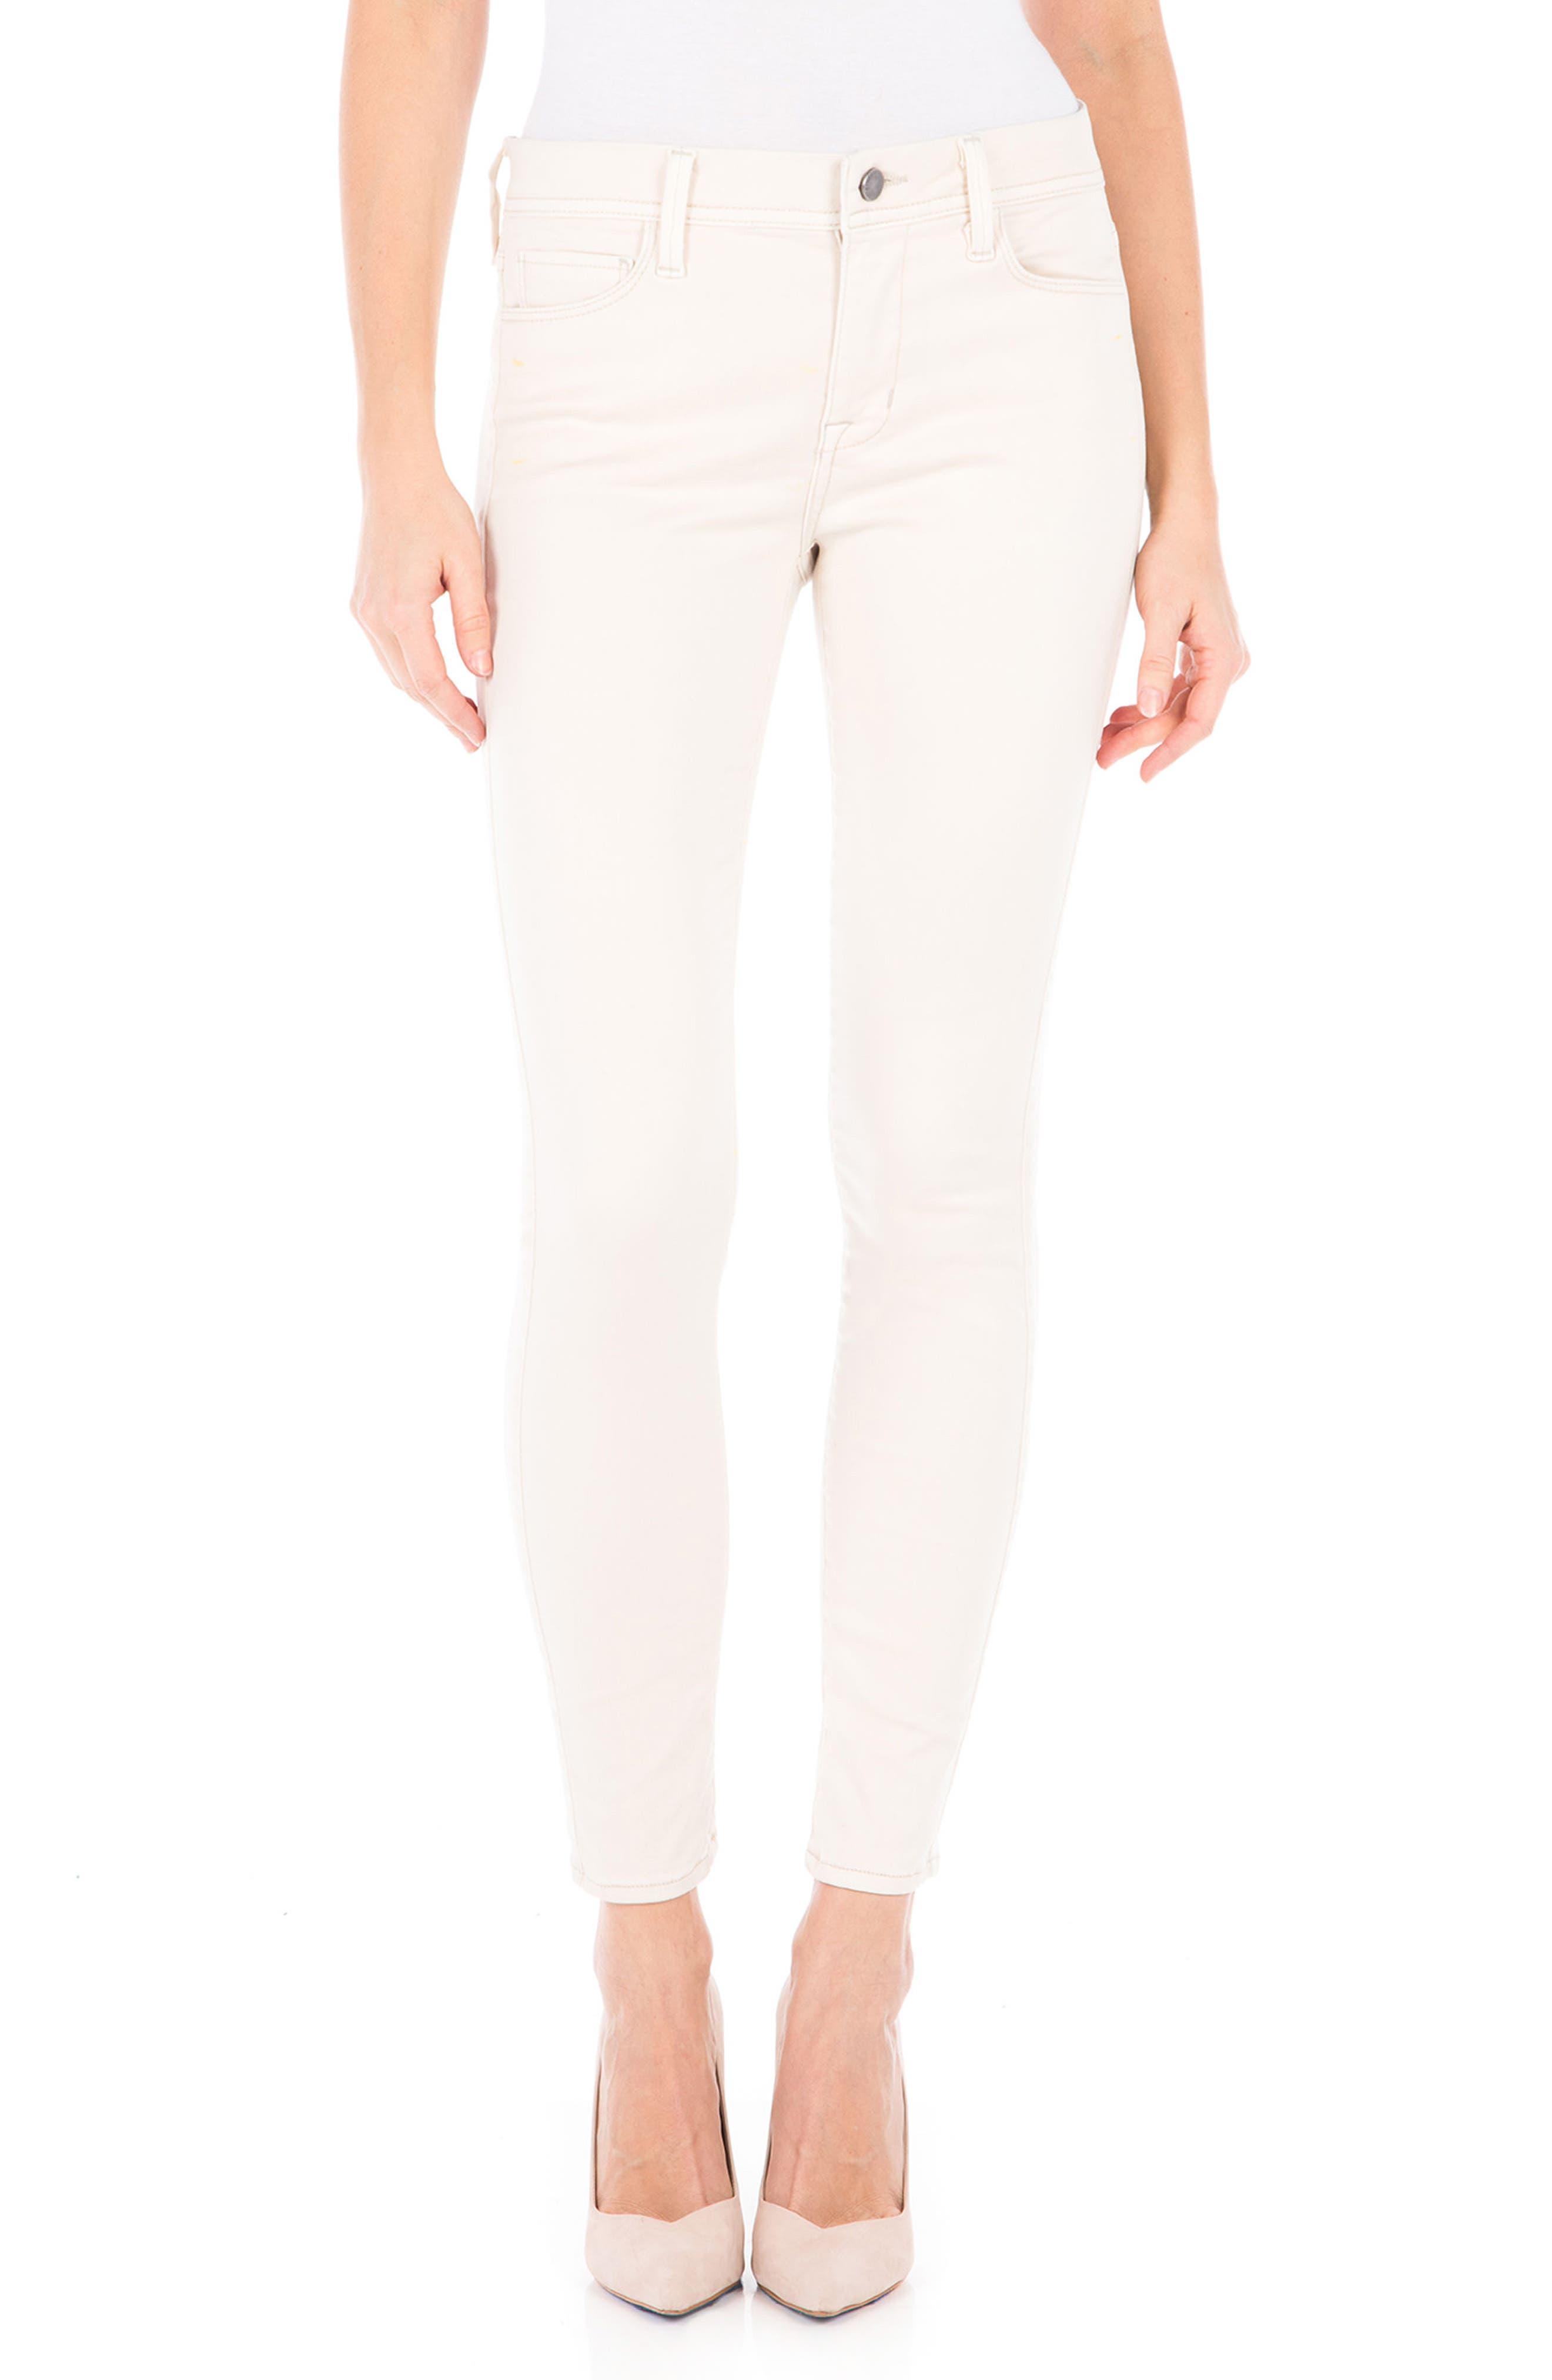 Sola Skinny Jeans,                         Main,                         color, White Rabbit